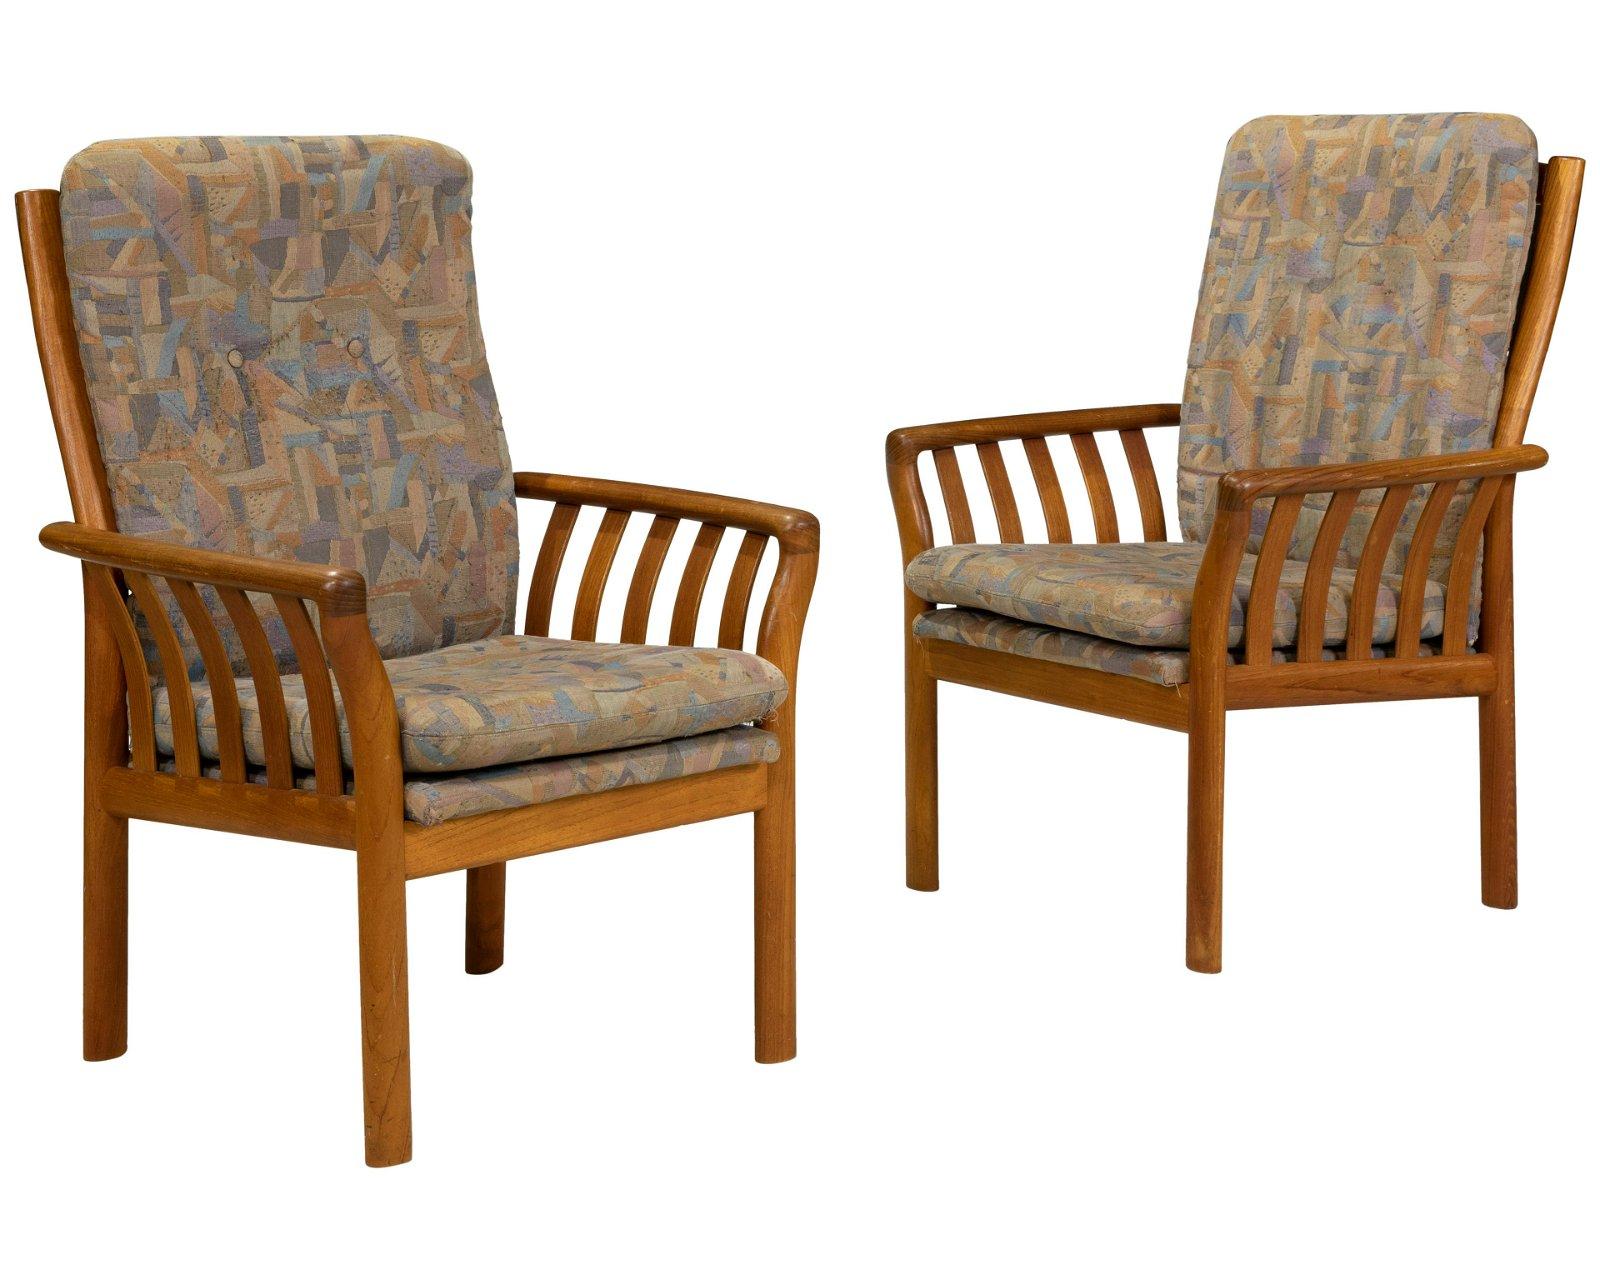 Danish Style Teak Arm Chairs